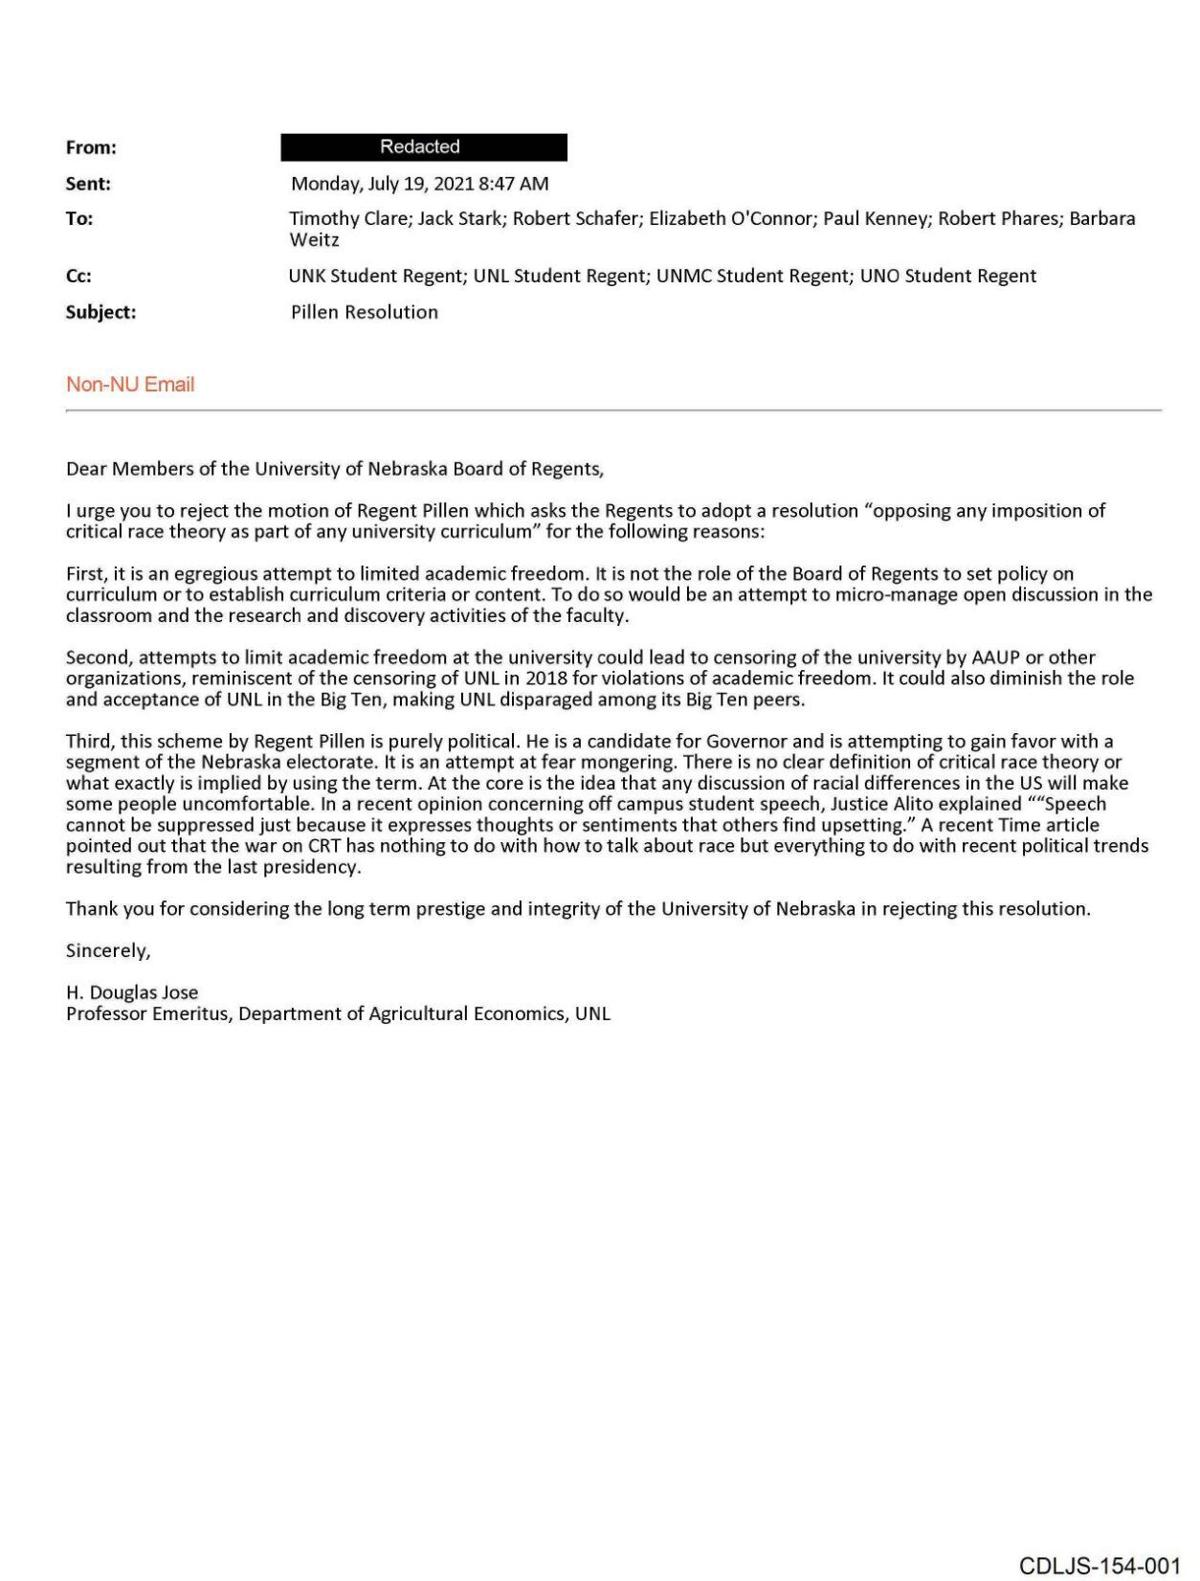 CDLJS-154-001.pdf